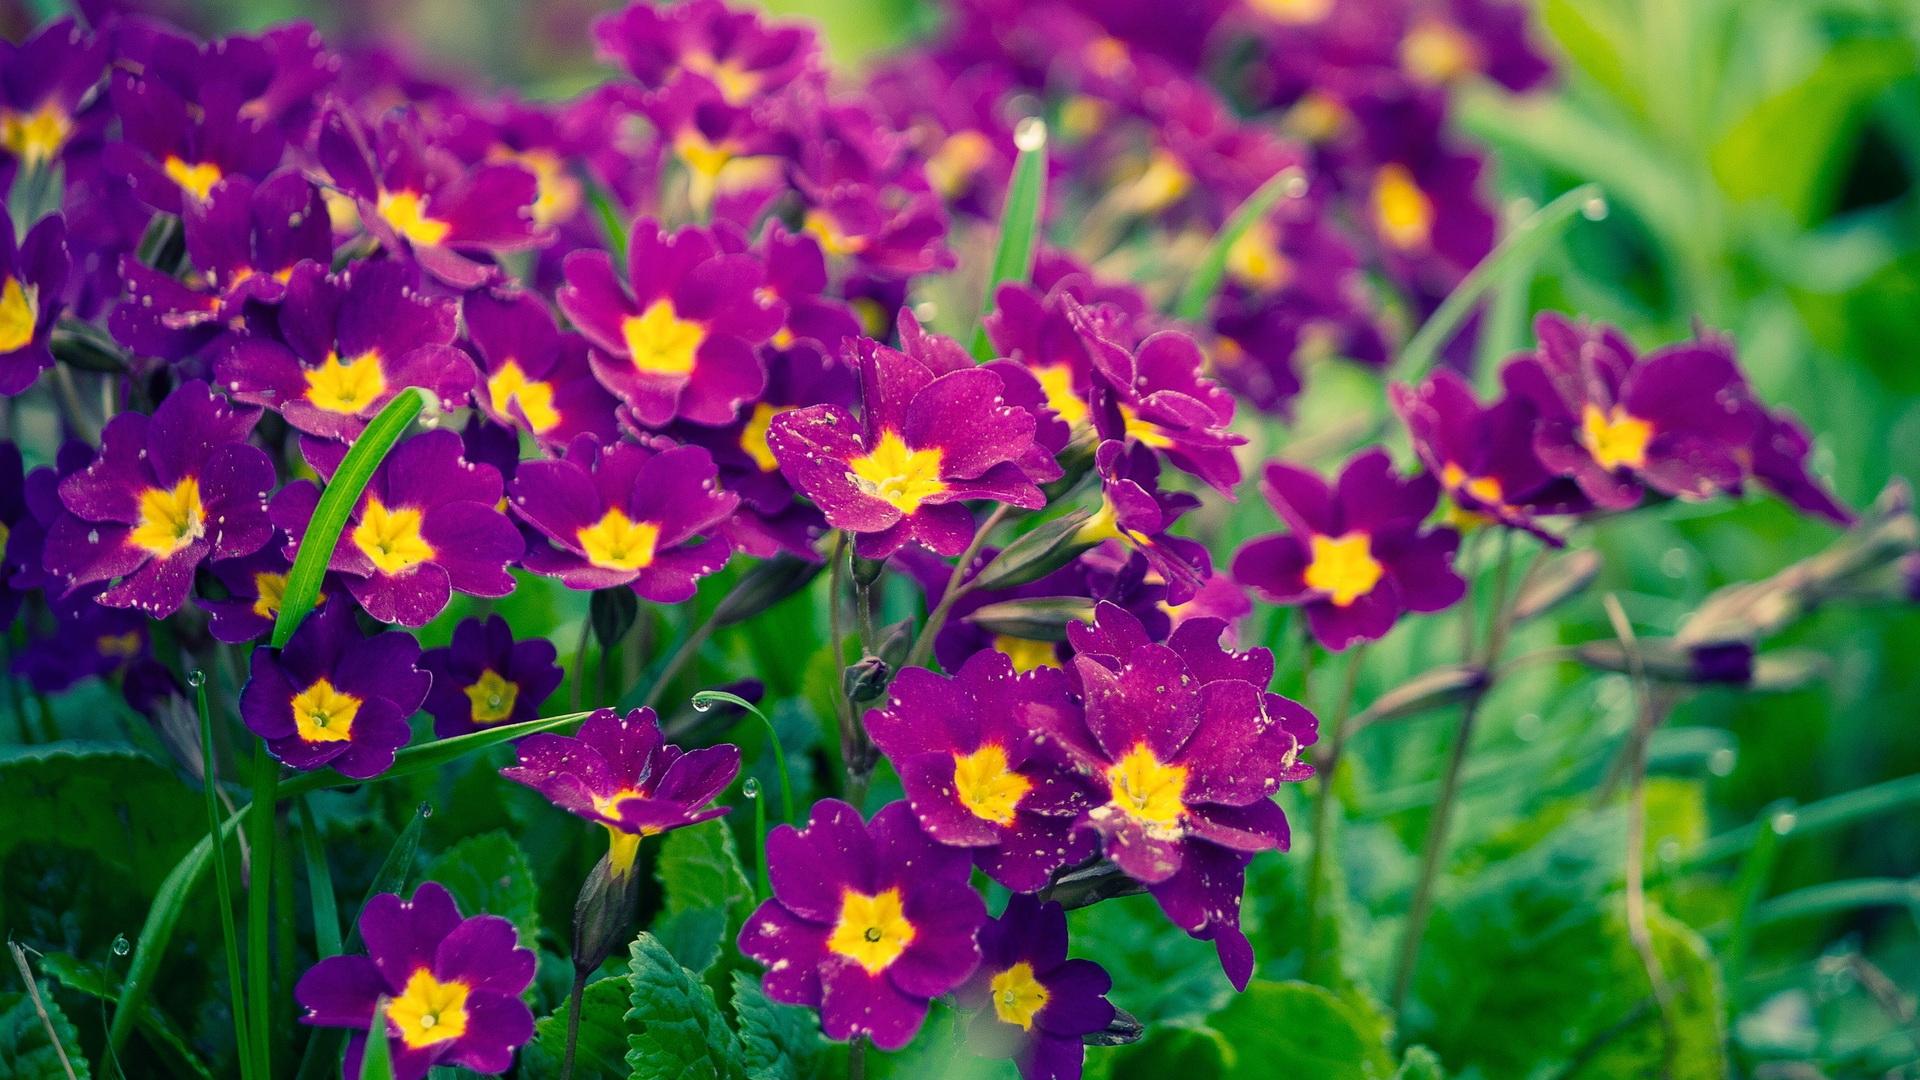 3d Depth Purple Abstract Wallpapers Purple Flowers Wallpaper 1920x1080 38160